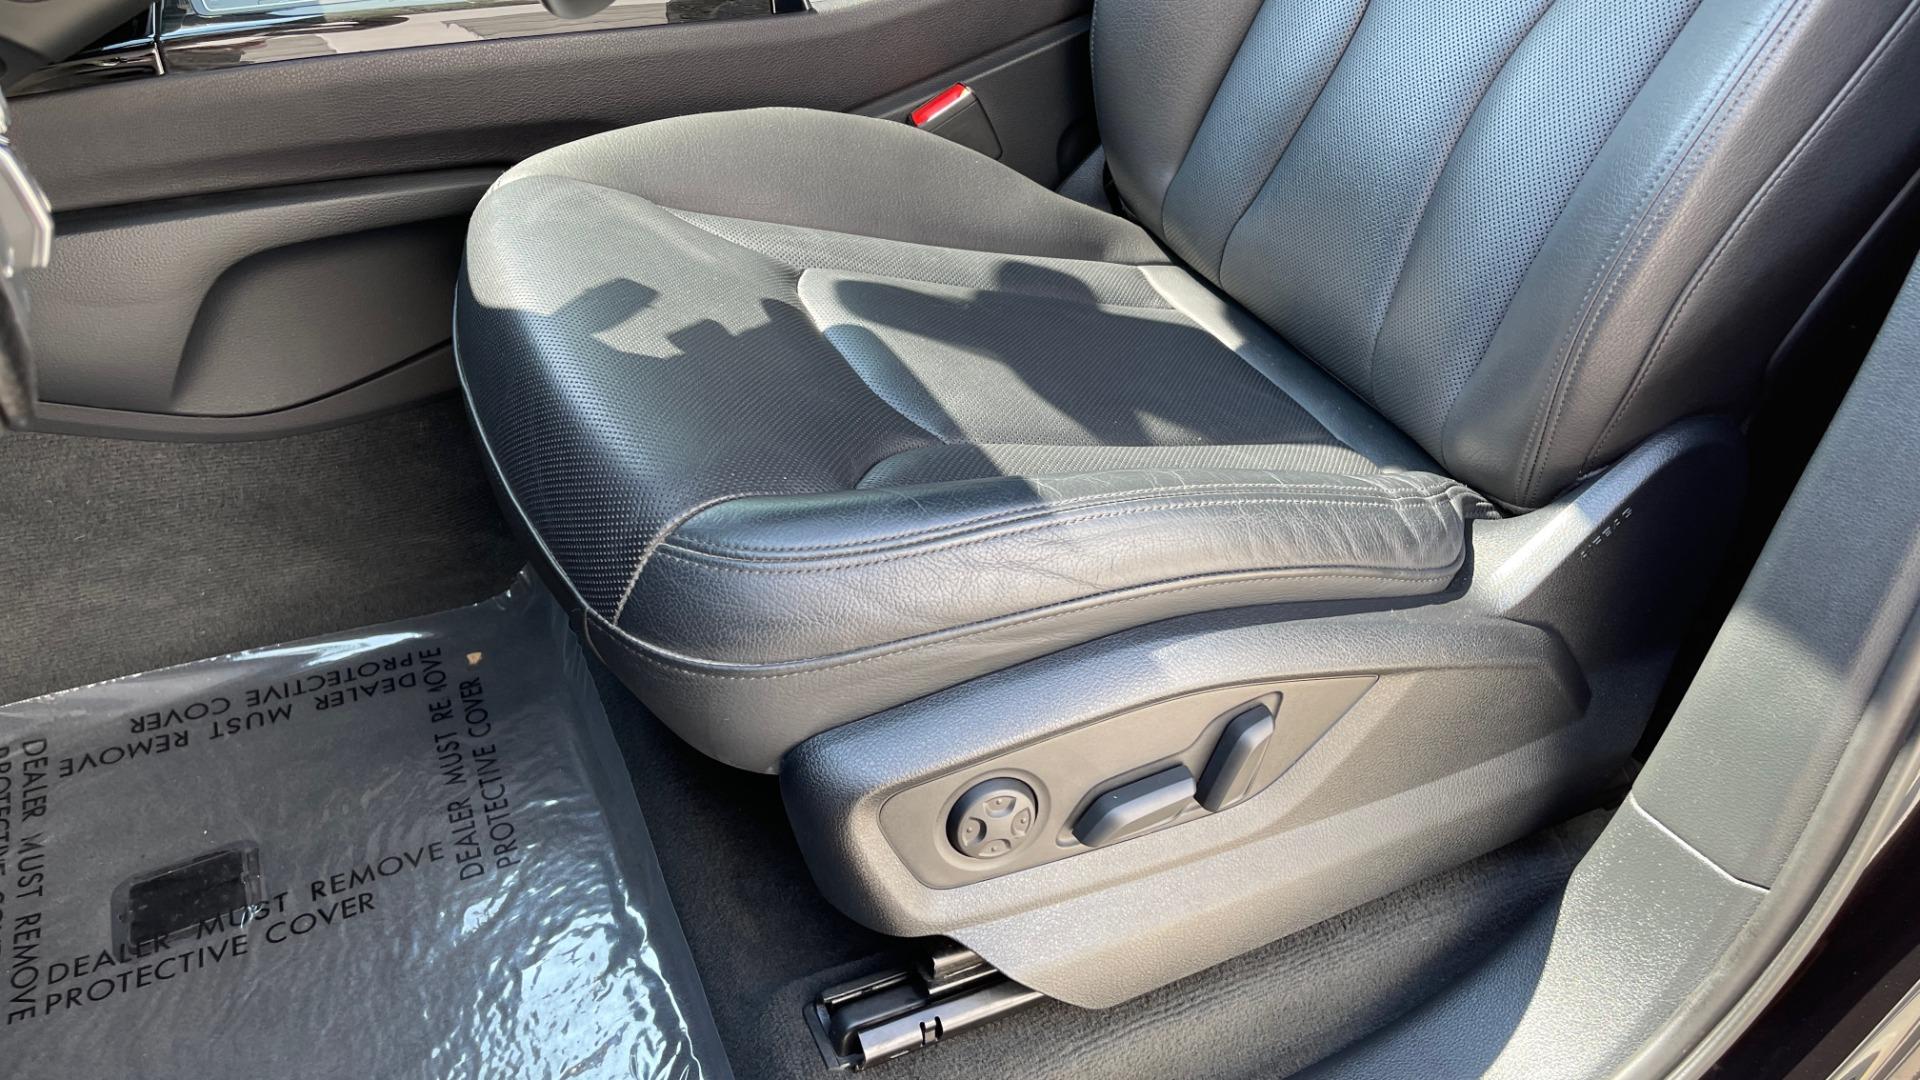 Used 2018 Audi Q7 PRESTIGE TIPTRONIC / NAV / SUNROOF / ADAPTIVE PKG / DRVR ASST / CLD WTHR /  for sale $49,995 at Formula Imports in Charlotte NC 28227 31